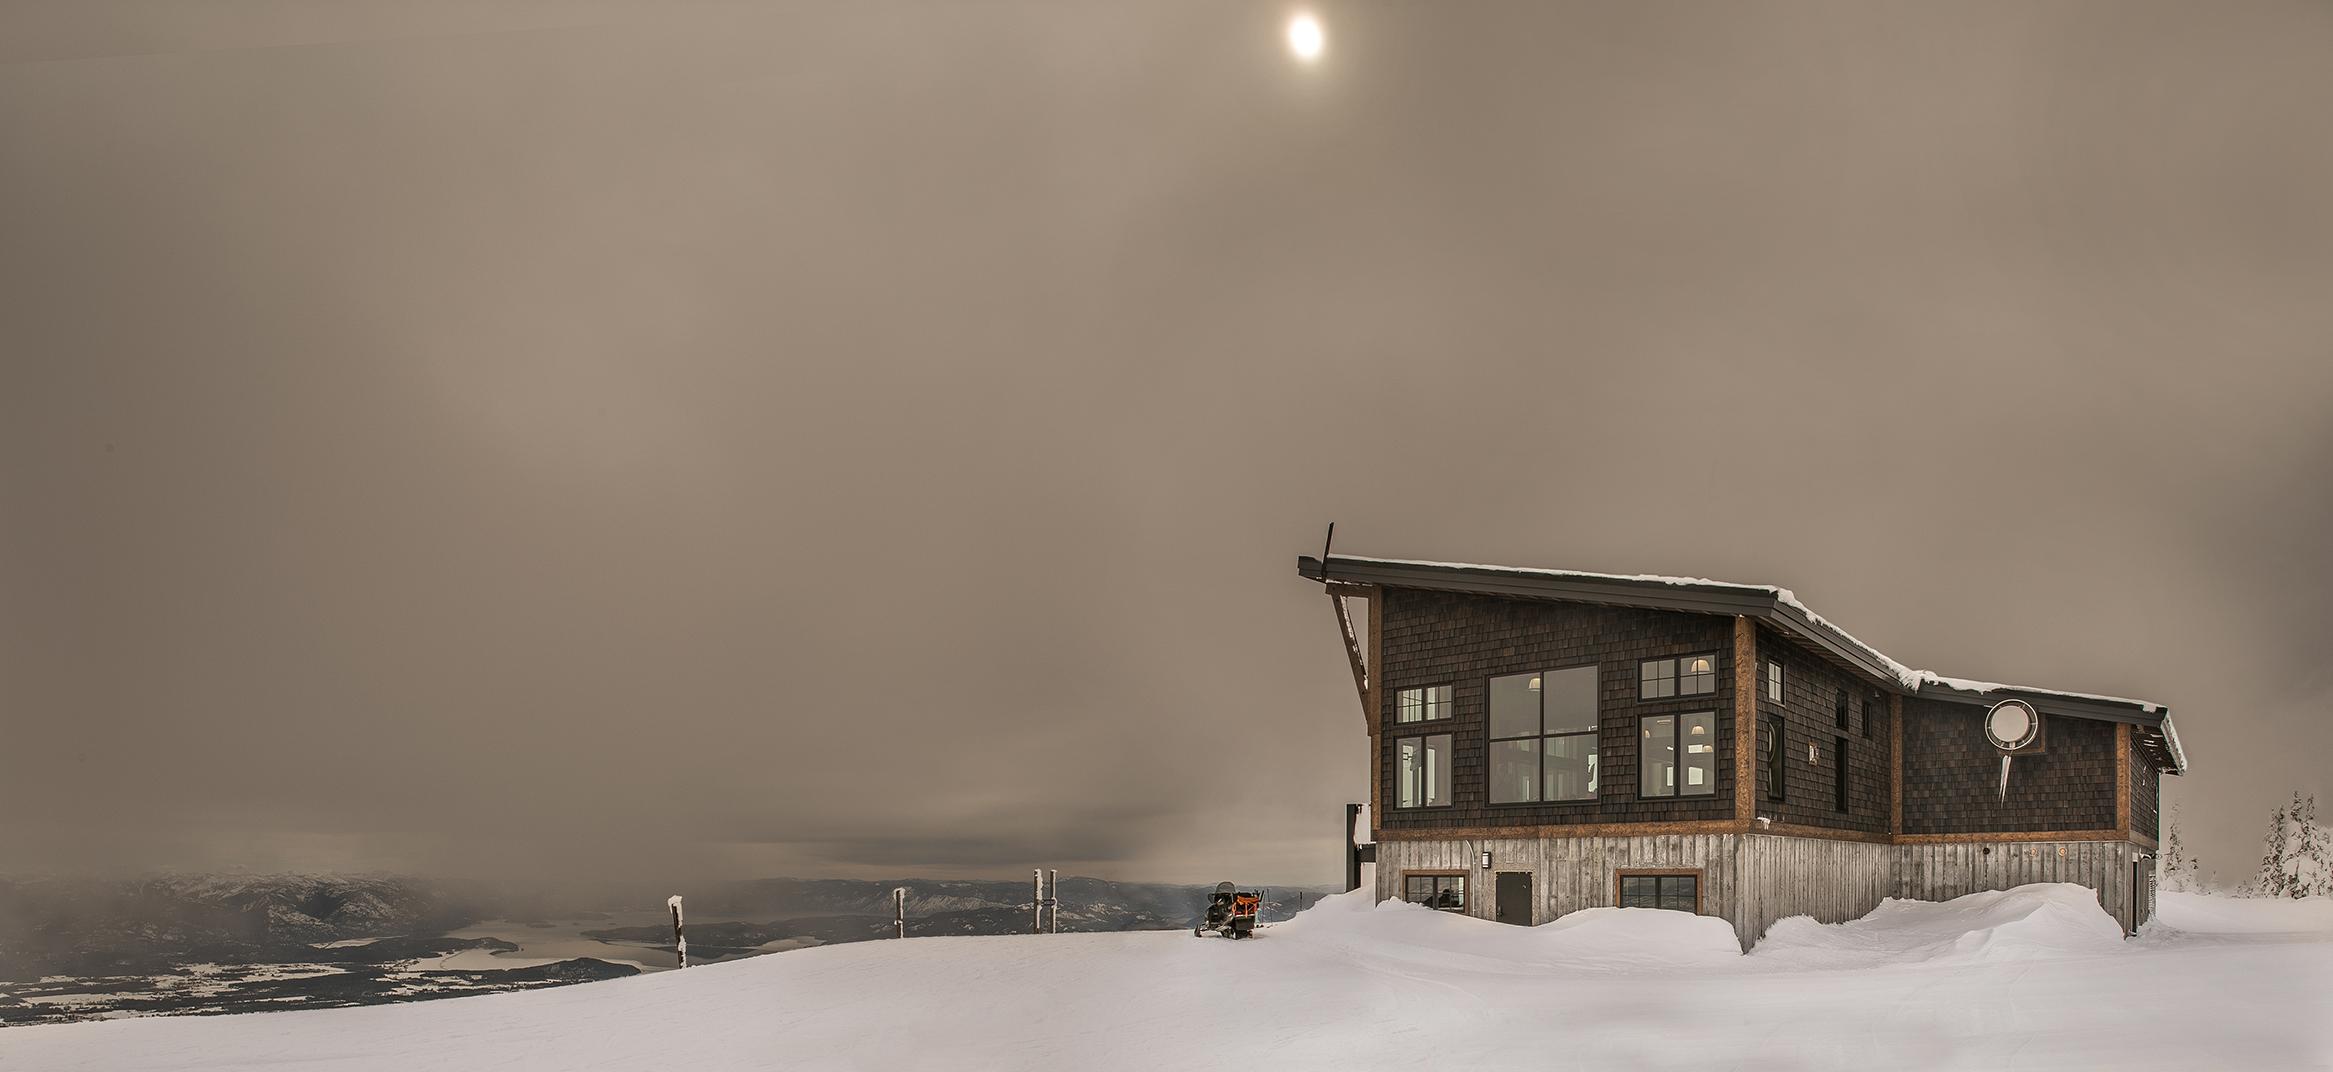 Skyhouse-Exterior-Sky-Schweitzer-Lodge.jpg